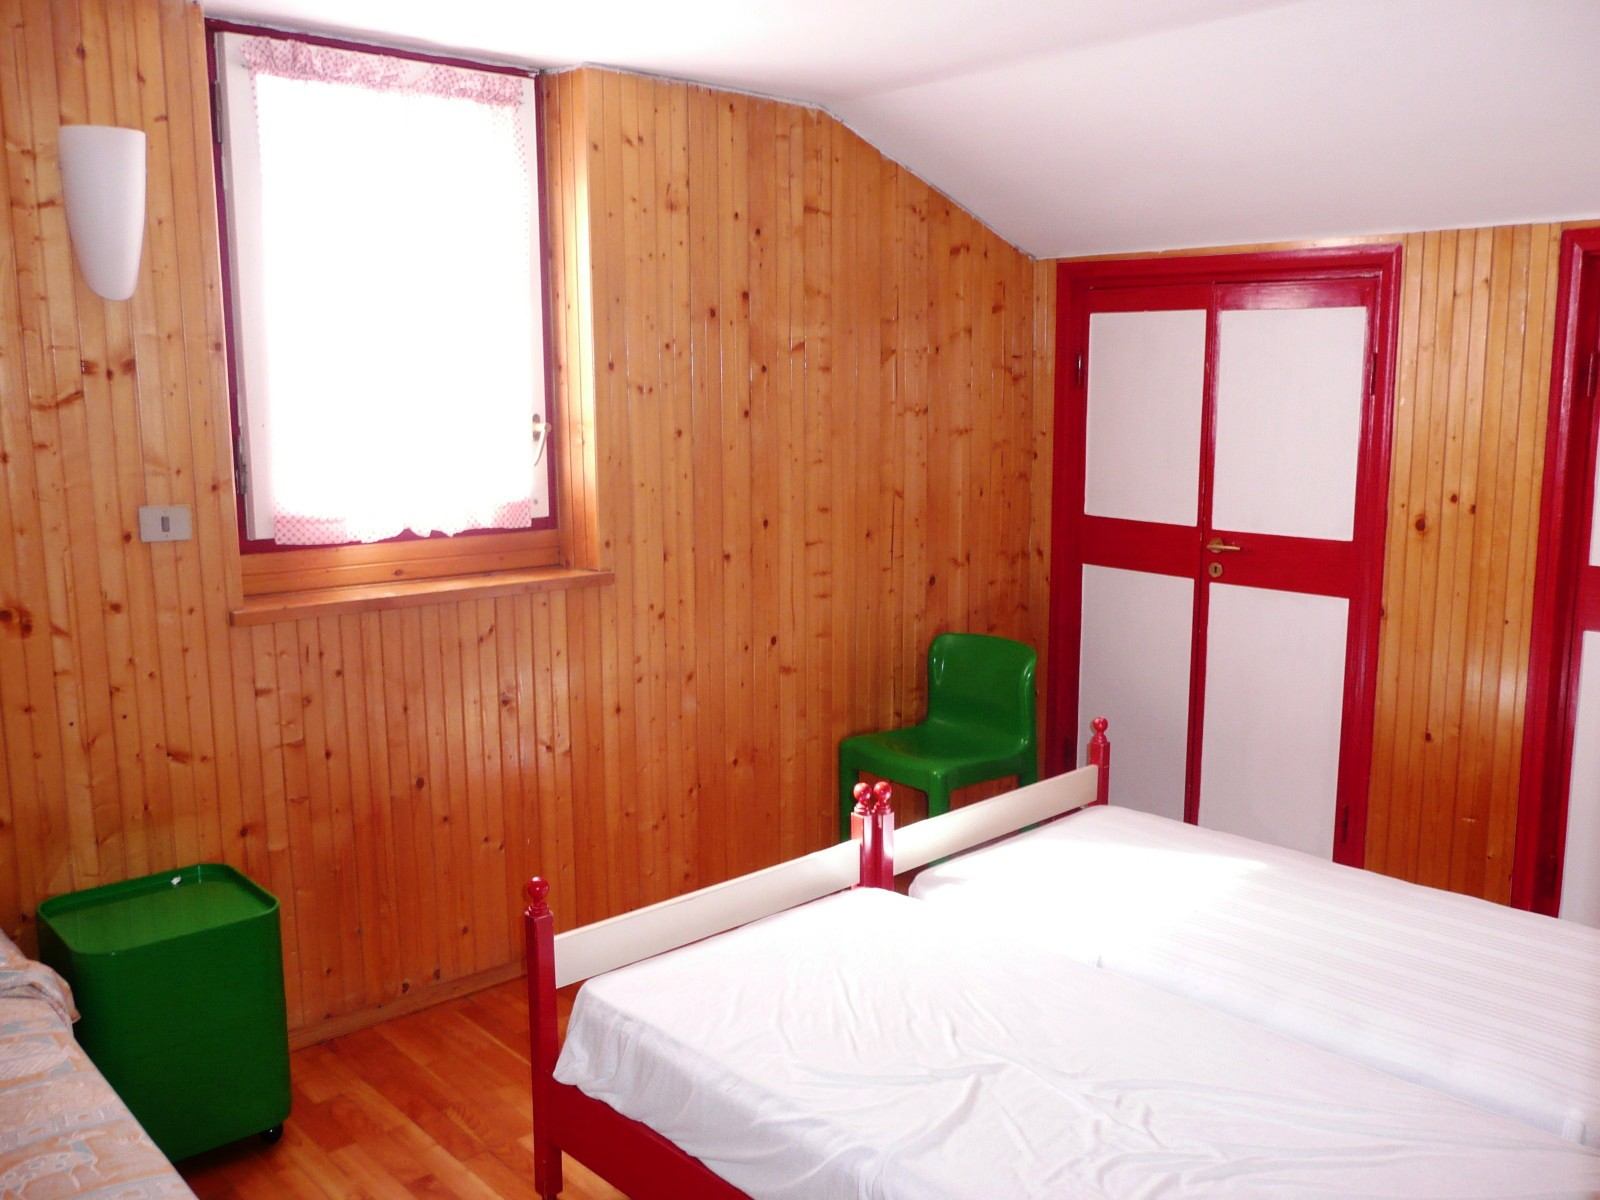 chambre coucher. Black Bedroom Furniture Sets. Home Design Ideas